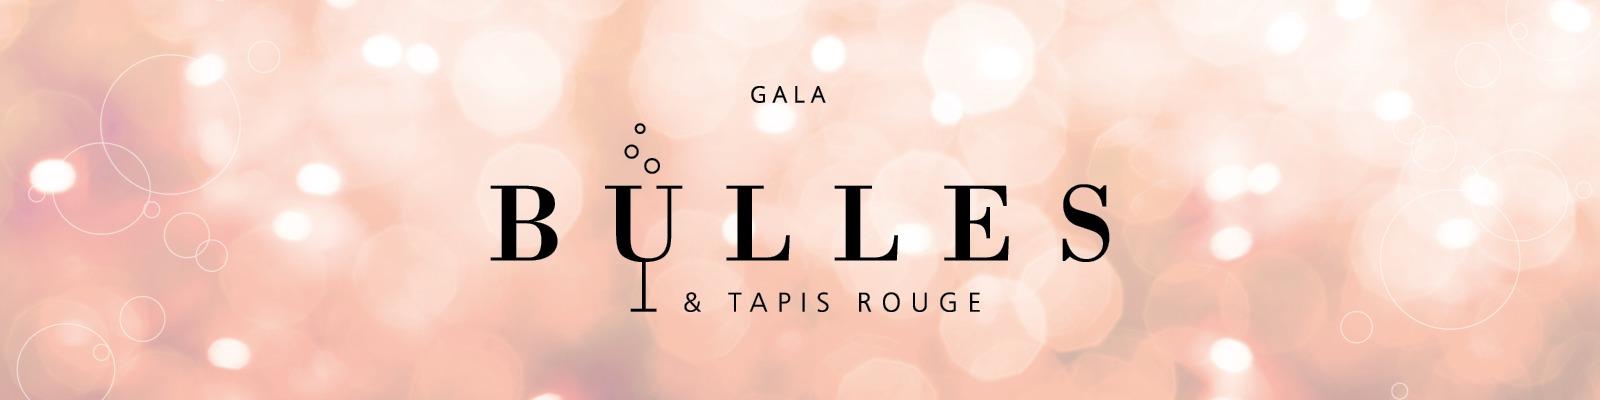 Gala Bulles & Tapis Rouge 2019